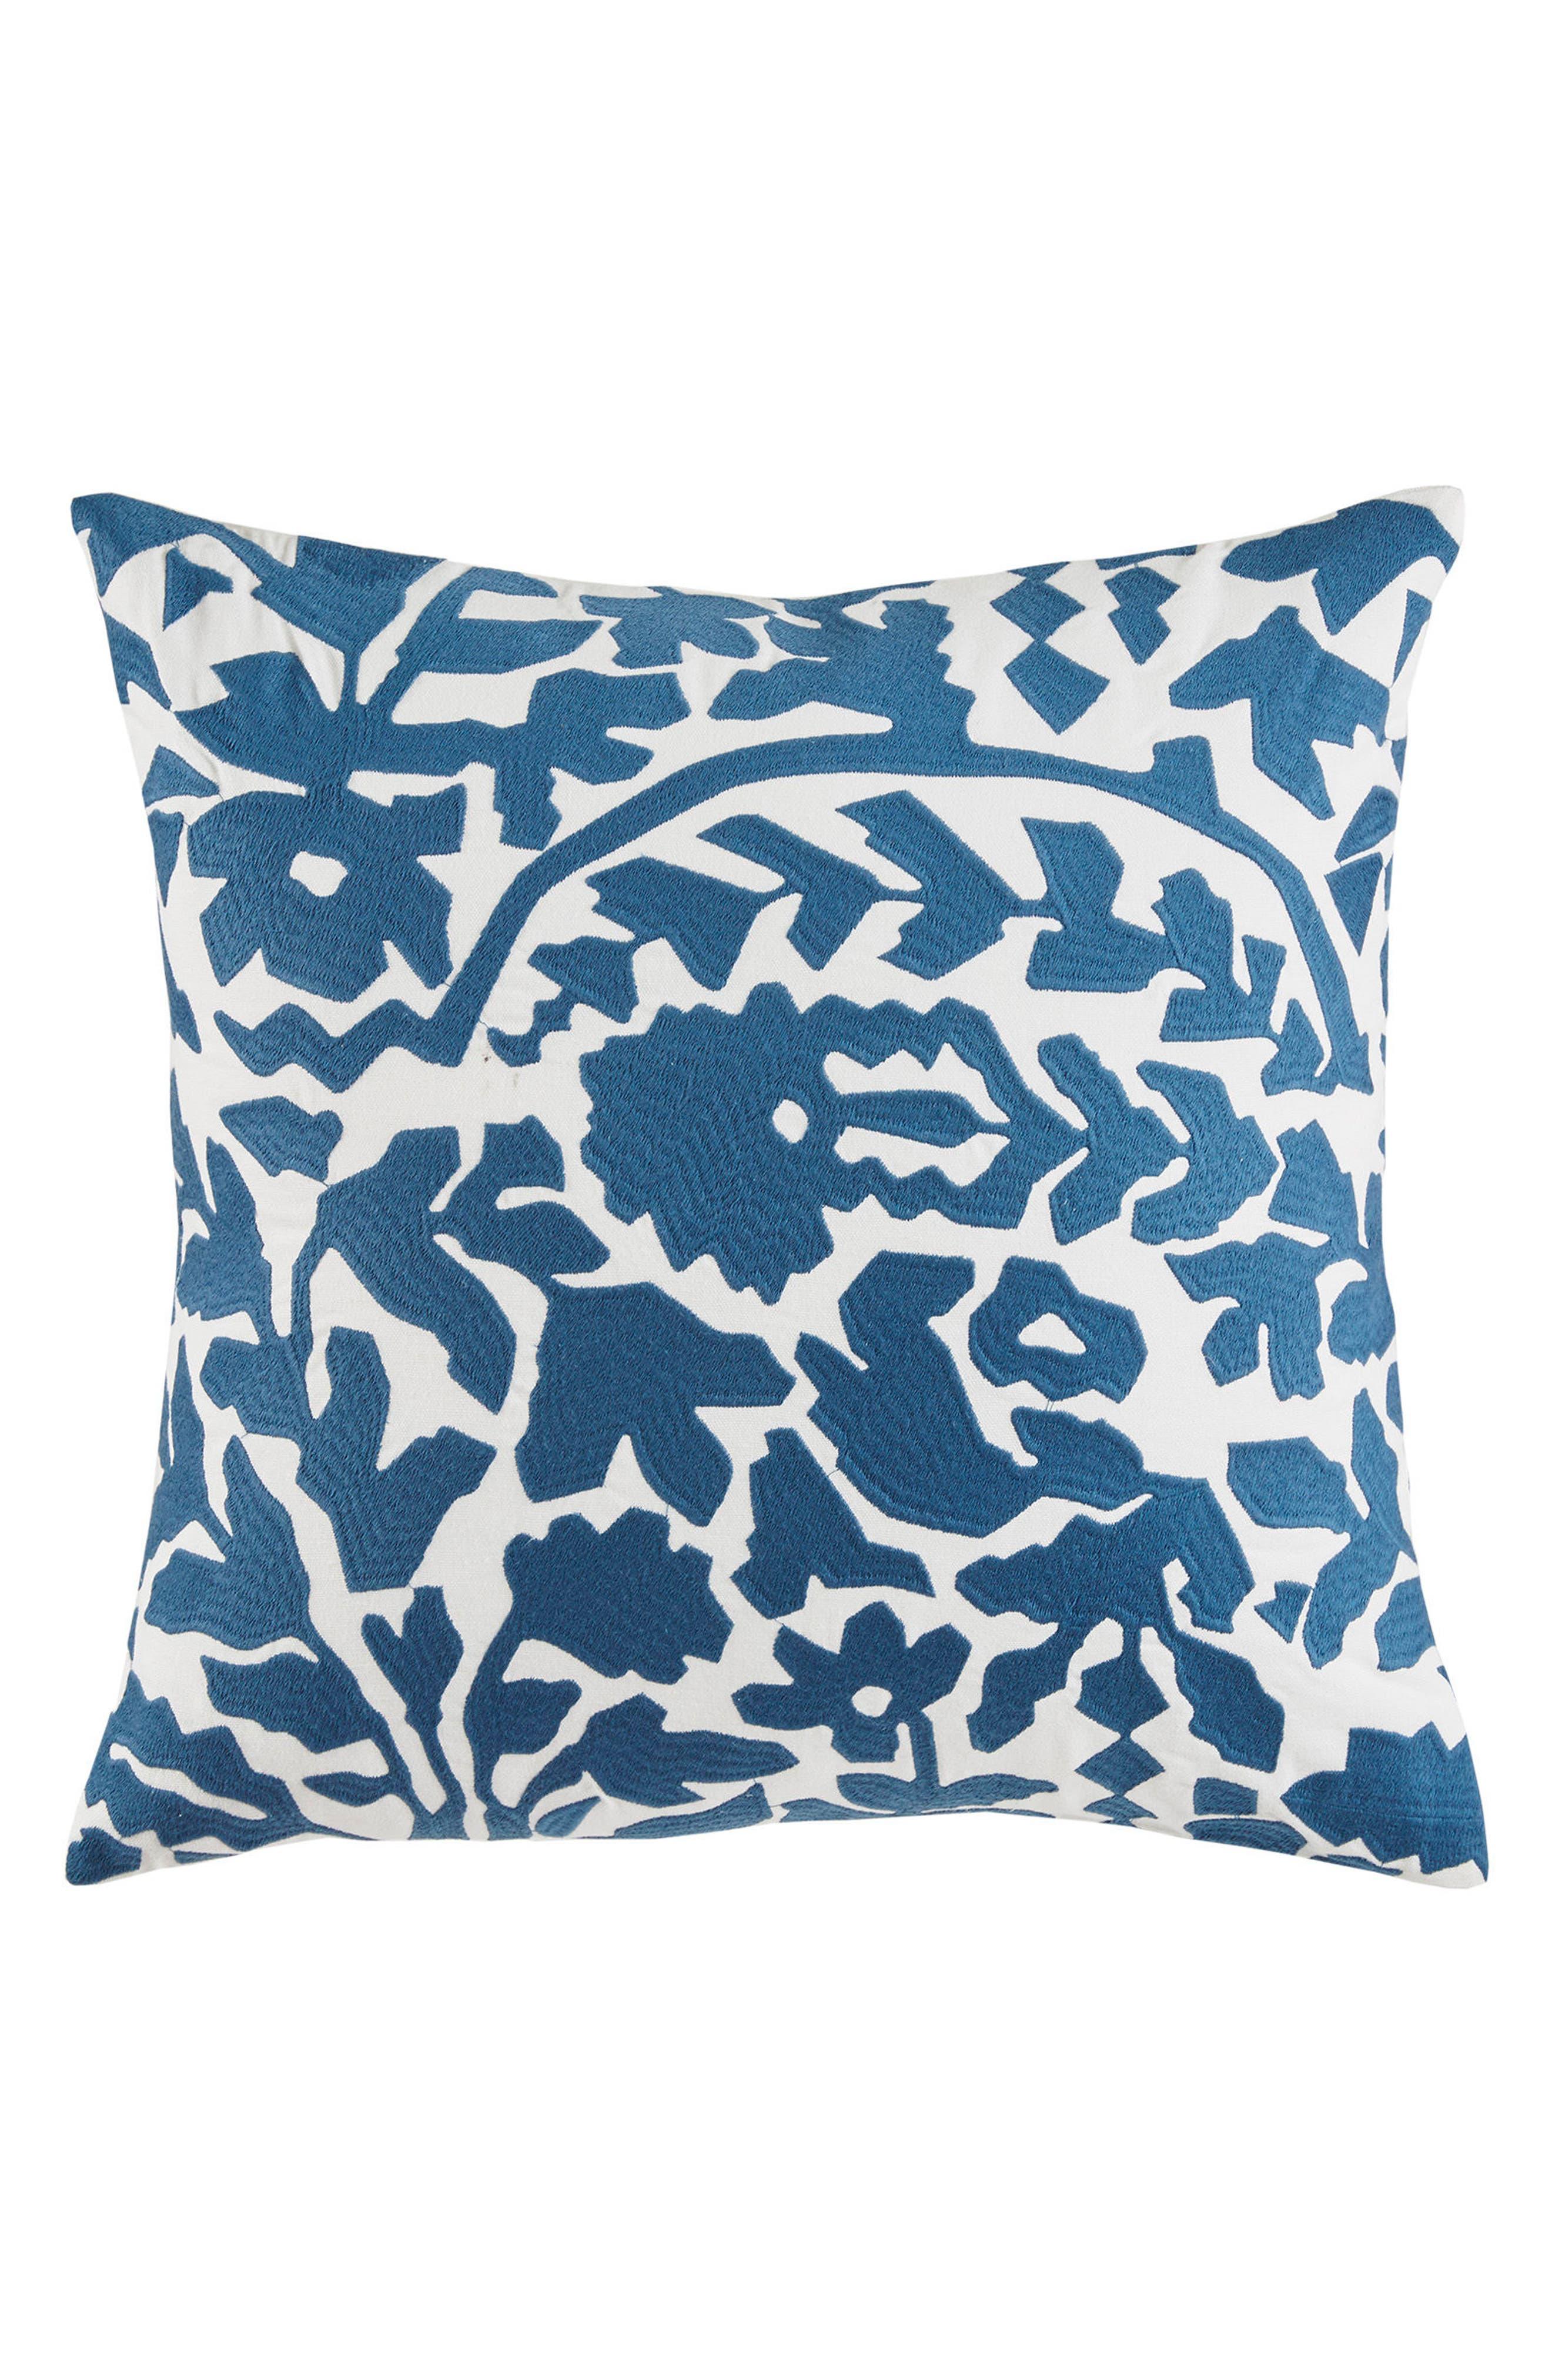 Main Image - DwellStudio Oaxaca Floral Accent Pillow